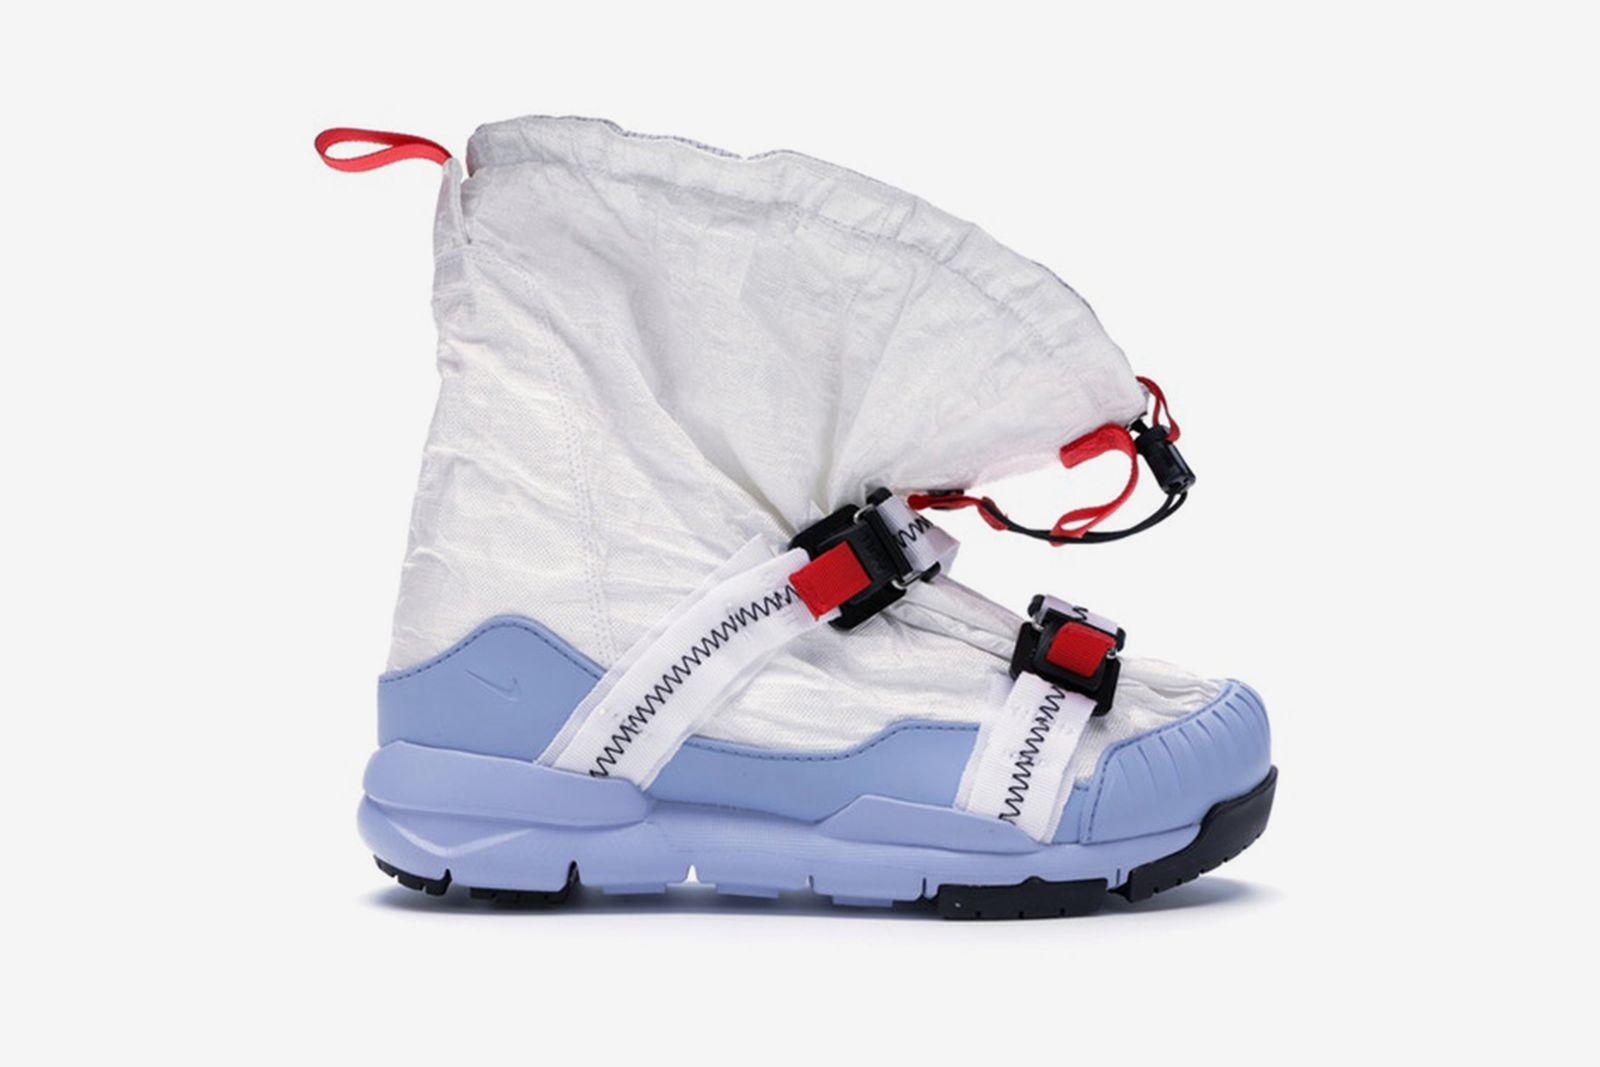 Bun-B-Nike-Mars-Yard-Overshoe-Tom-Sachs-WHO-Charity